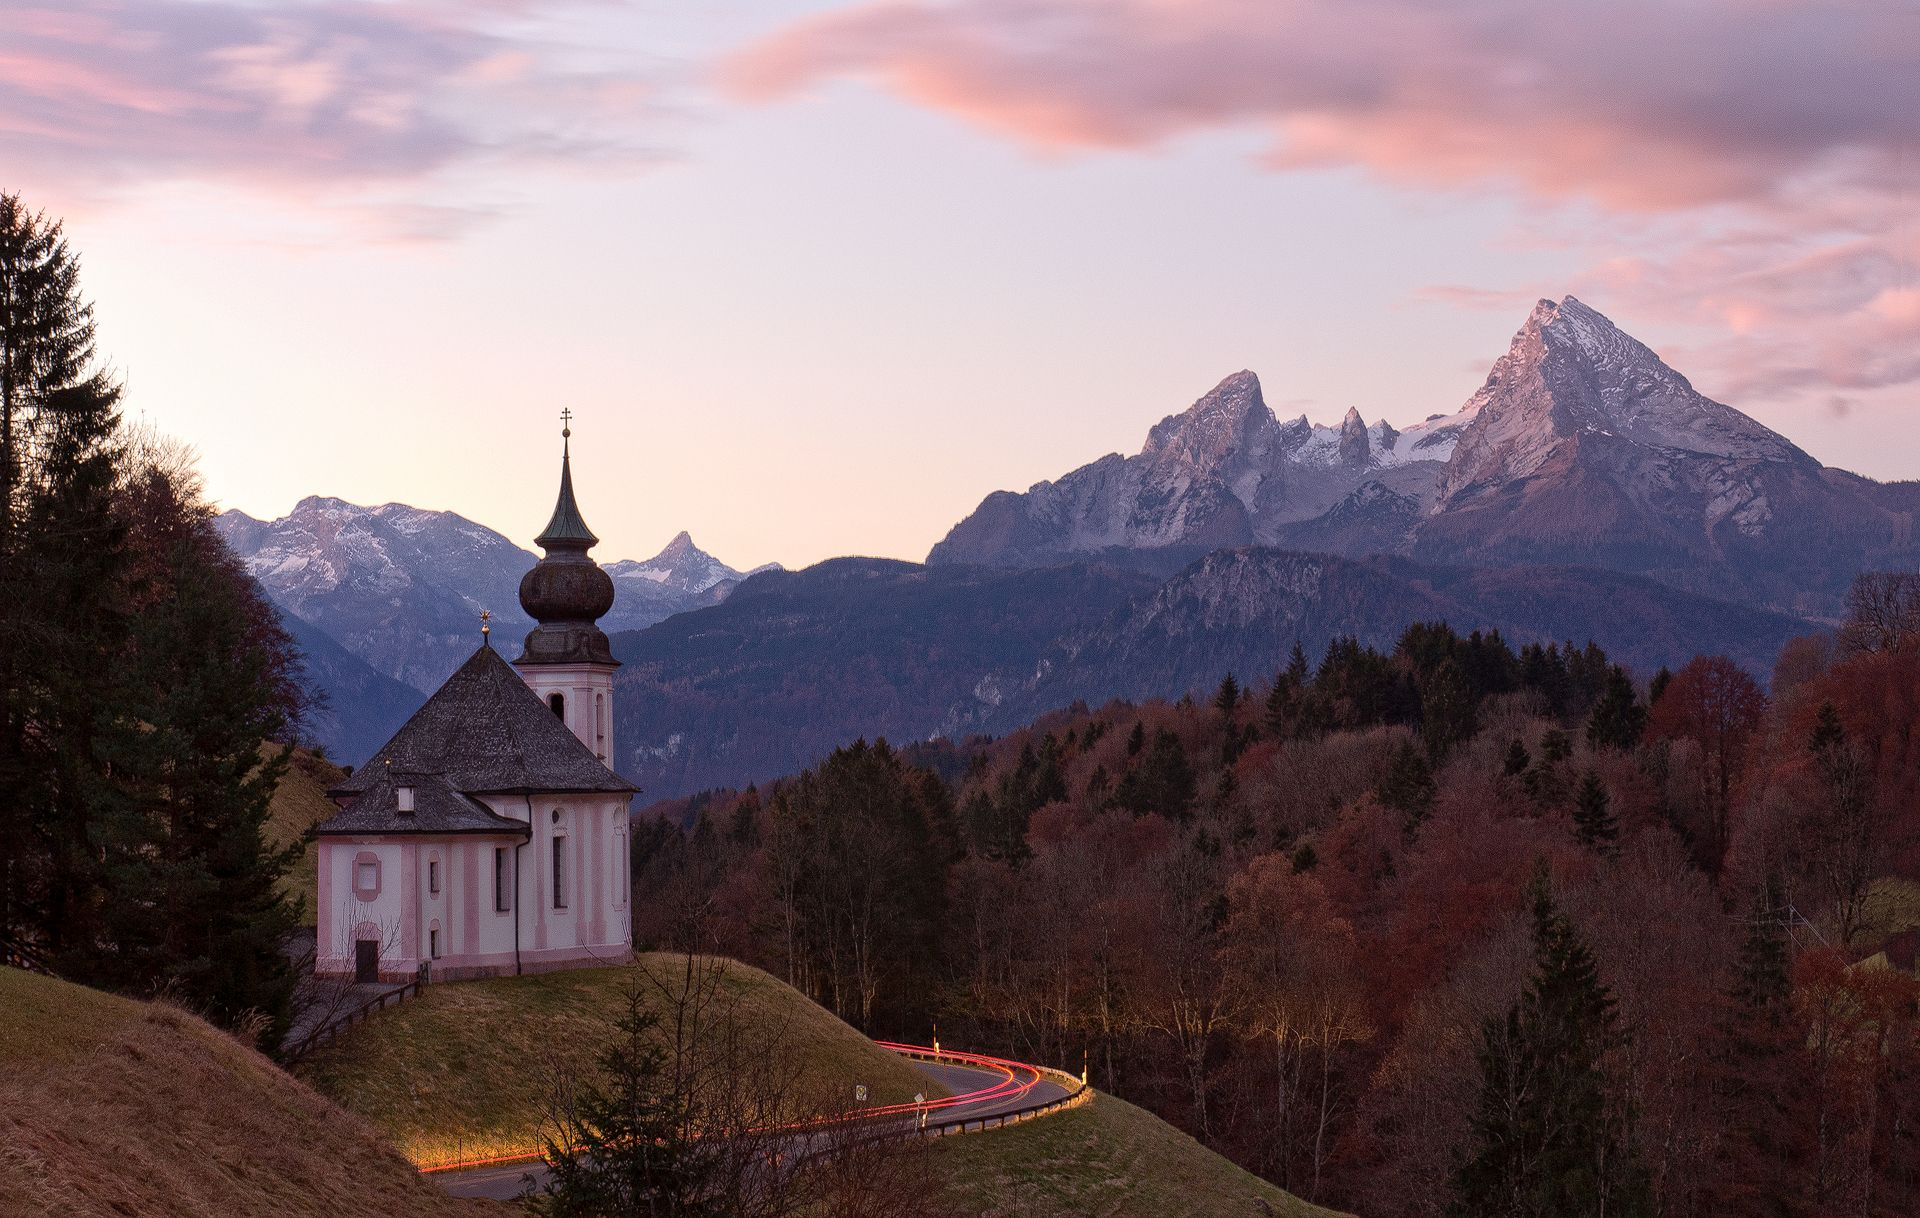 long exposure, car trail, light painting, Maria Gern (Church), Watzmann (Mountain), Bavarian Alps, Berchtesgaden, Germany